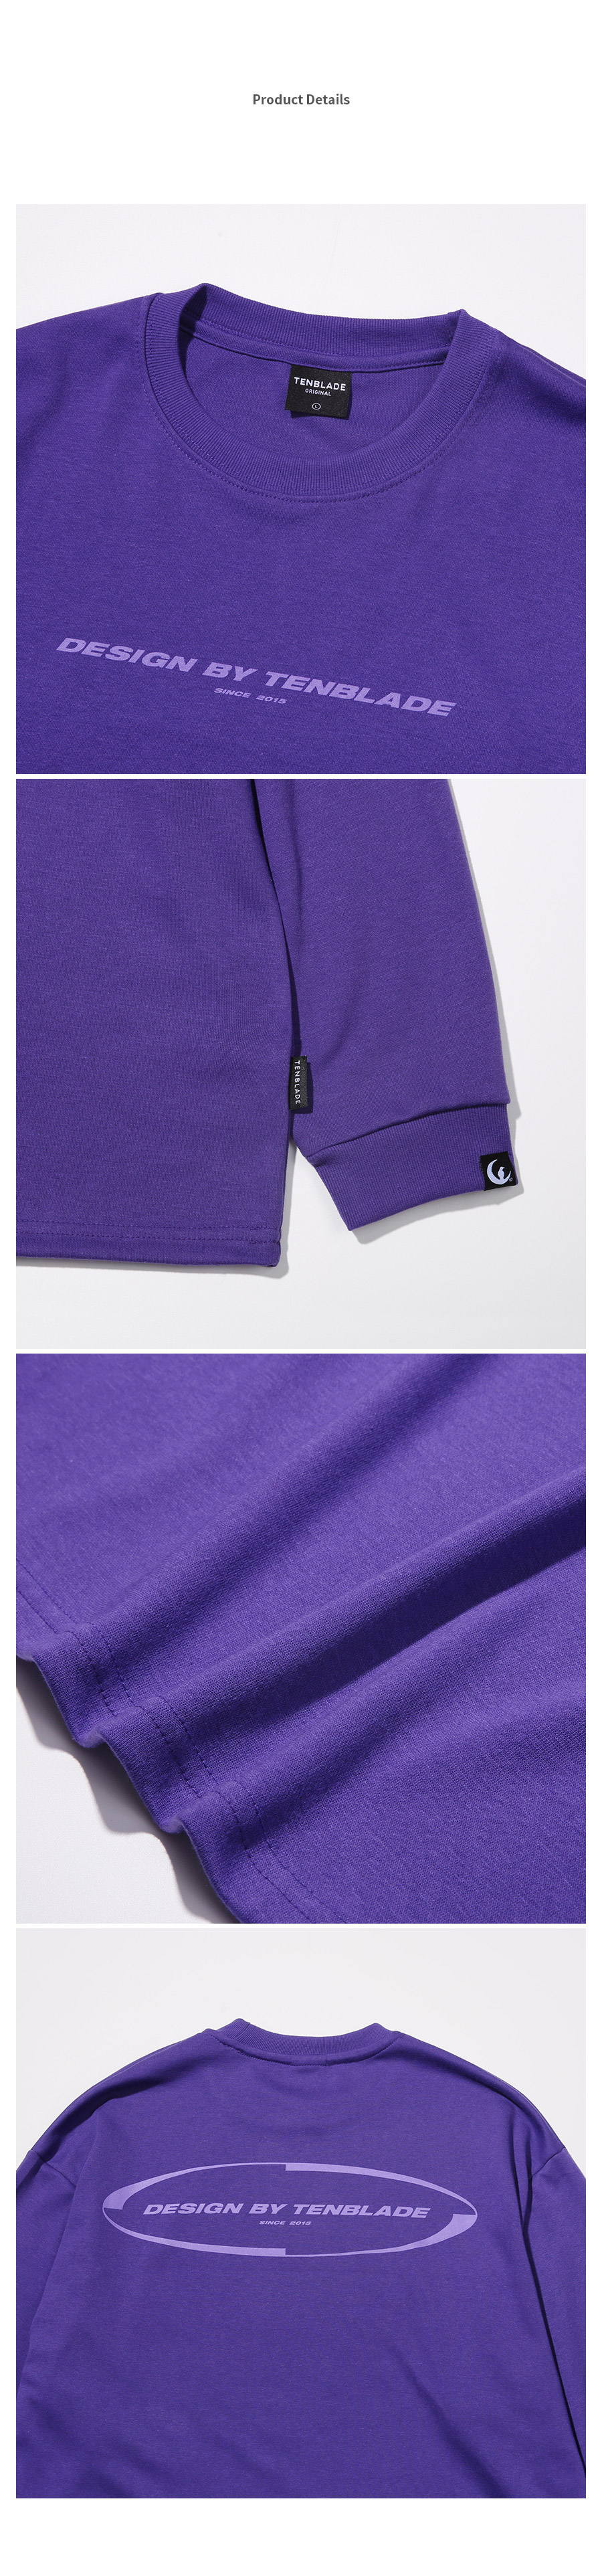 tai261ls-purple_06.jpg